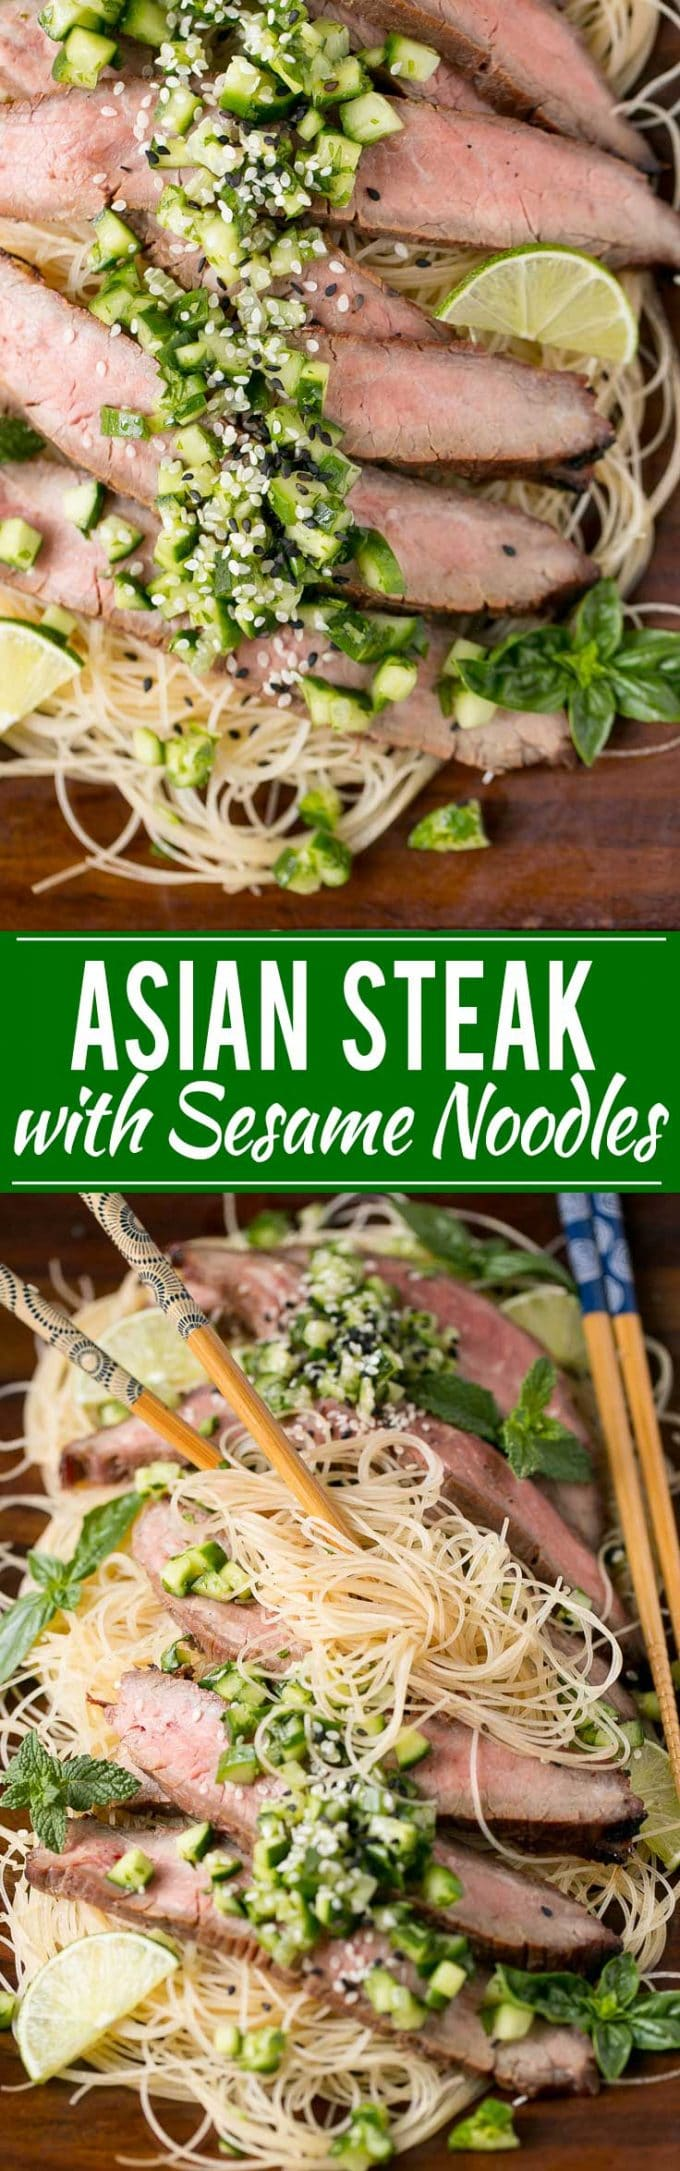 Soy Marinated Flank Steak Recipe | Cucumber Relish Recipe | Best Marinated Steak | Soy Marinade | Best Cucumber Relish | Asian Marinated Steak | Best Asian Marinated Flank Steak | Asian Steak with Sesame Noodles